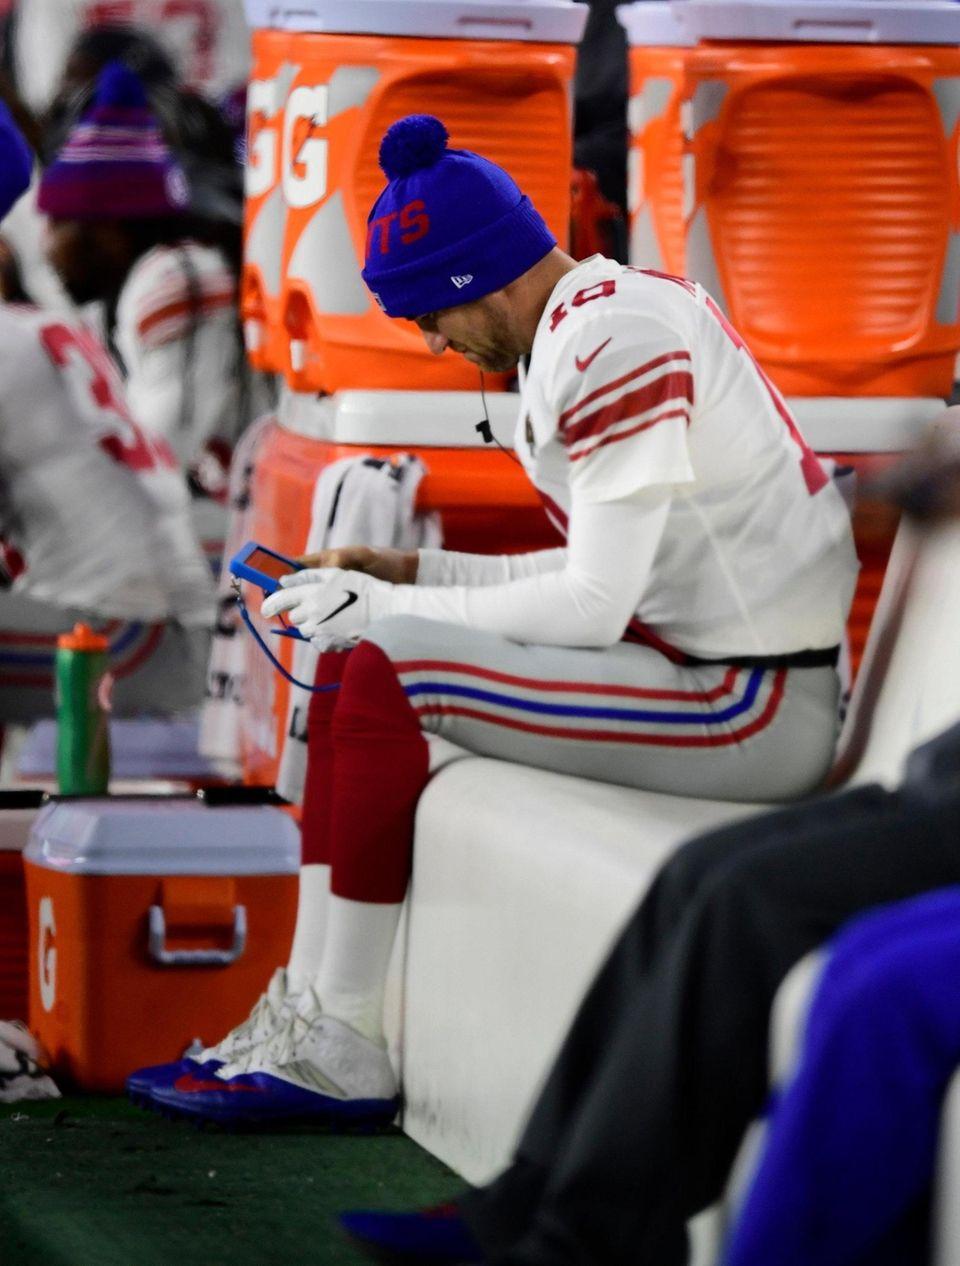 Giants quarterback Eli Manning sits on the bench